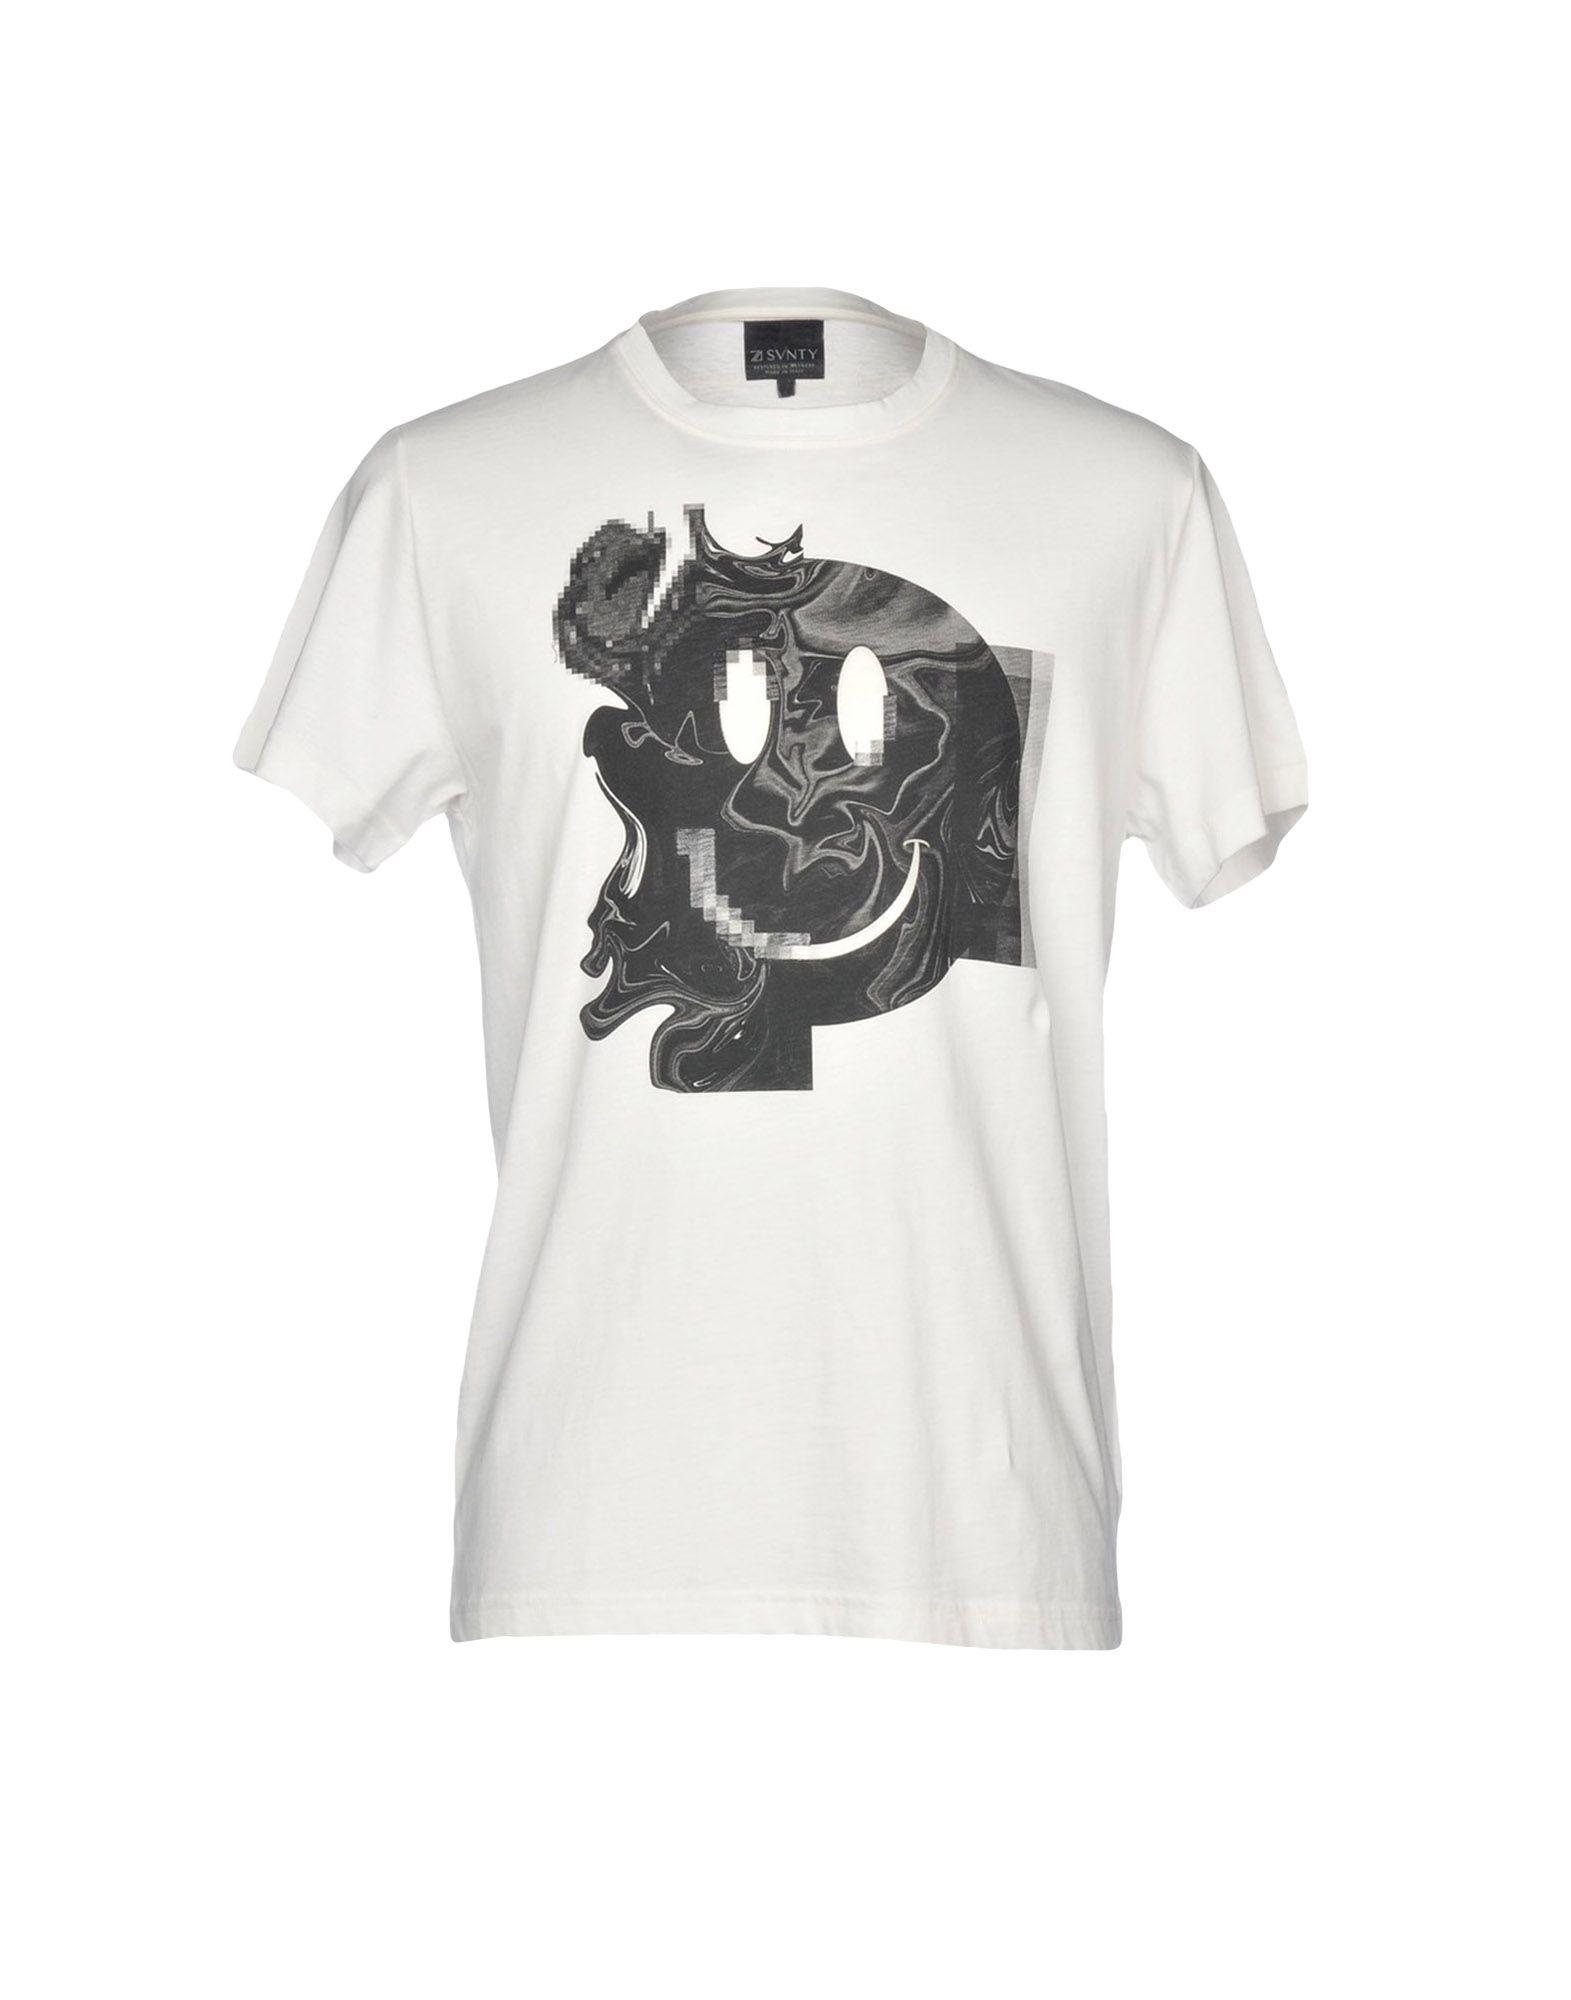 SVNTY T-Shirt in Ivory